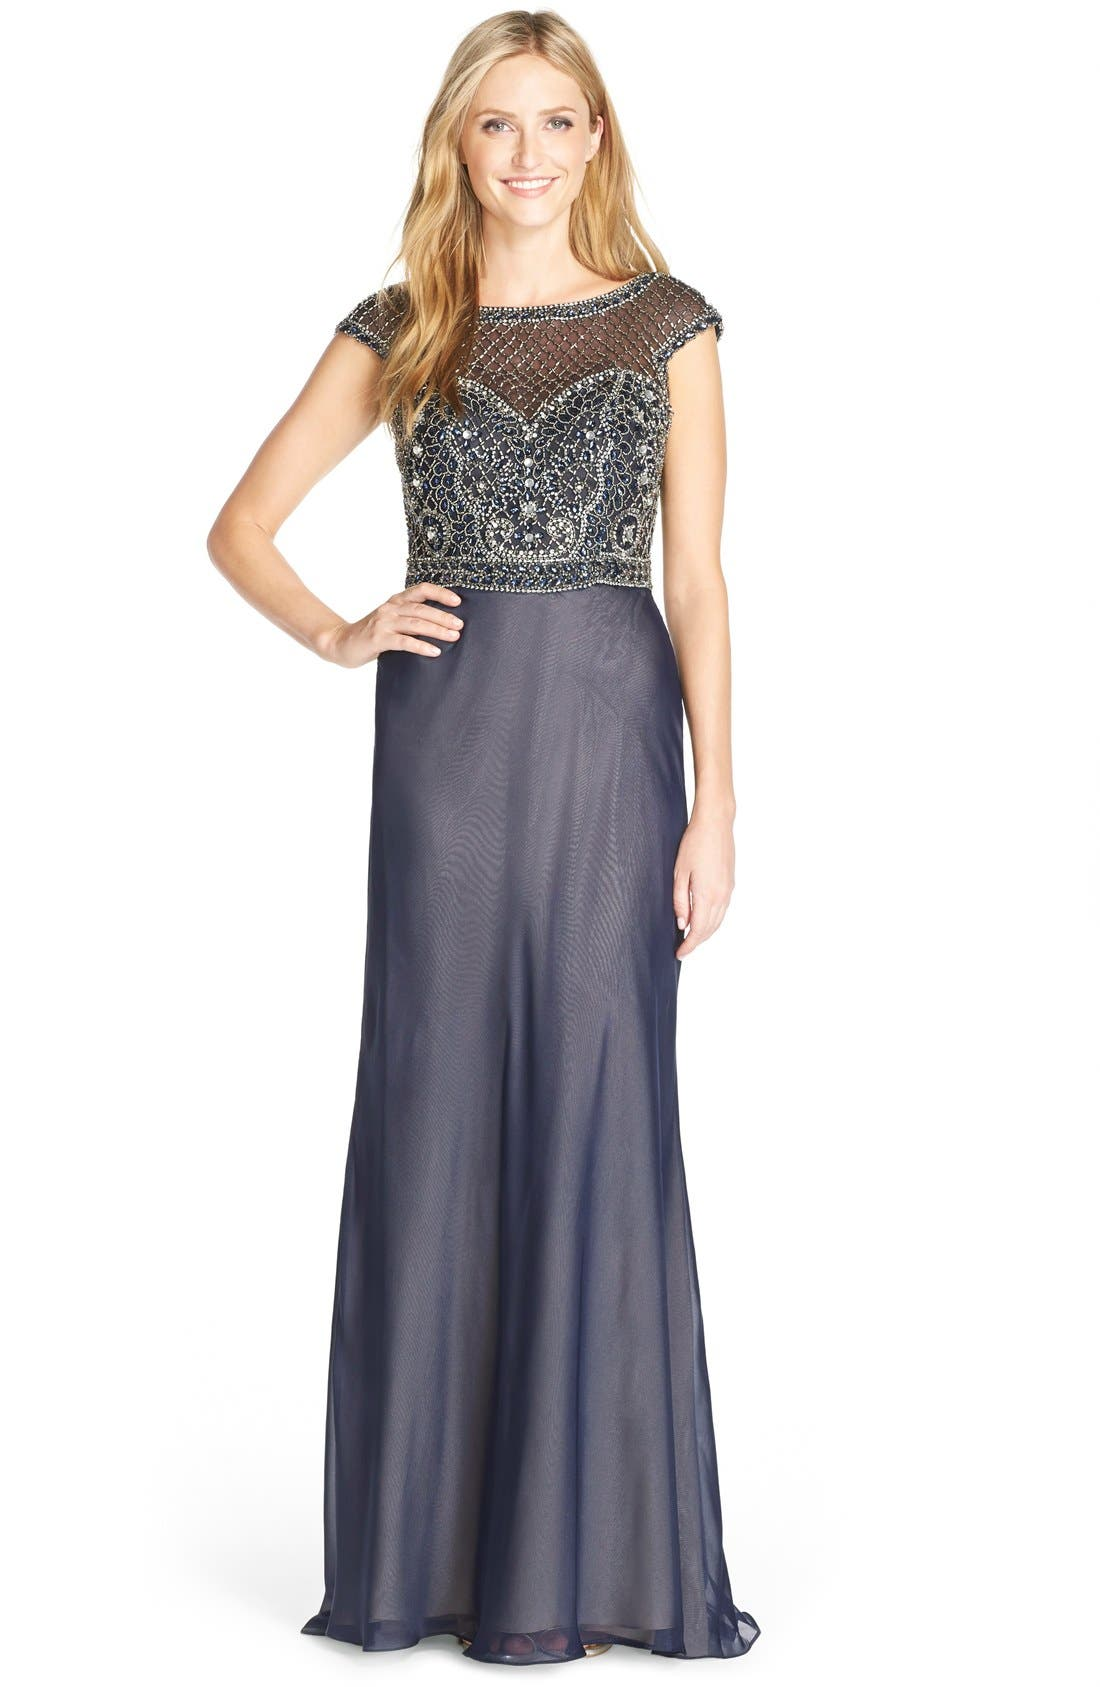 Main Image - Terani Couture Embellished Chiffon Gown